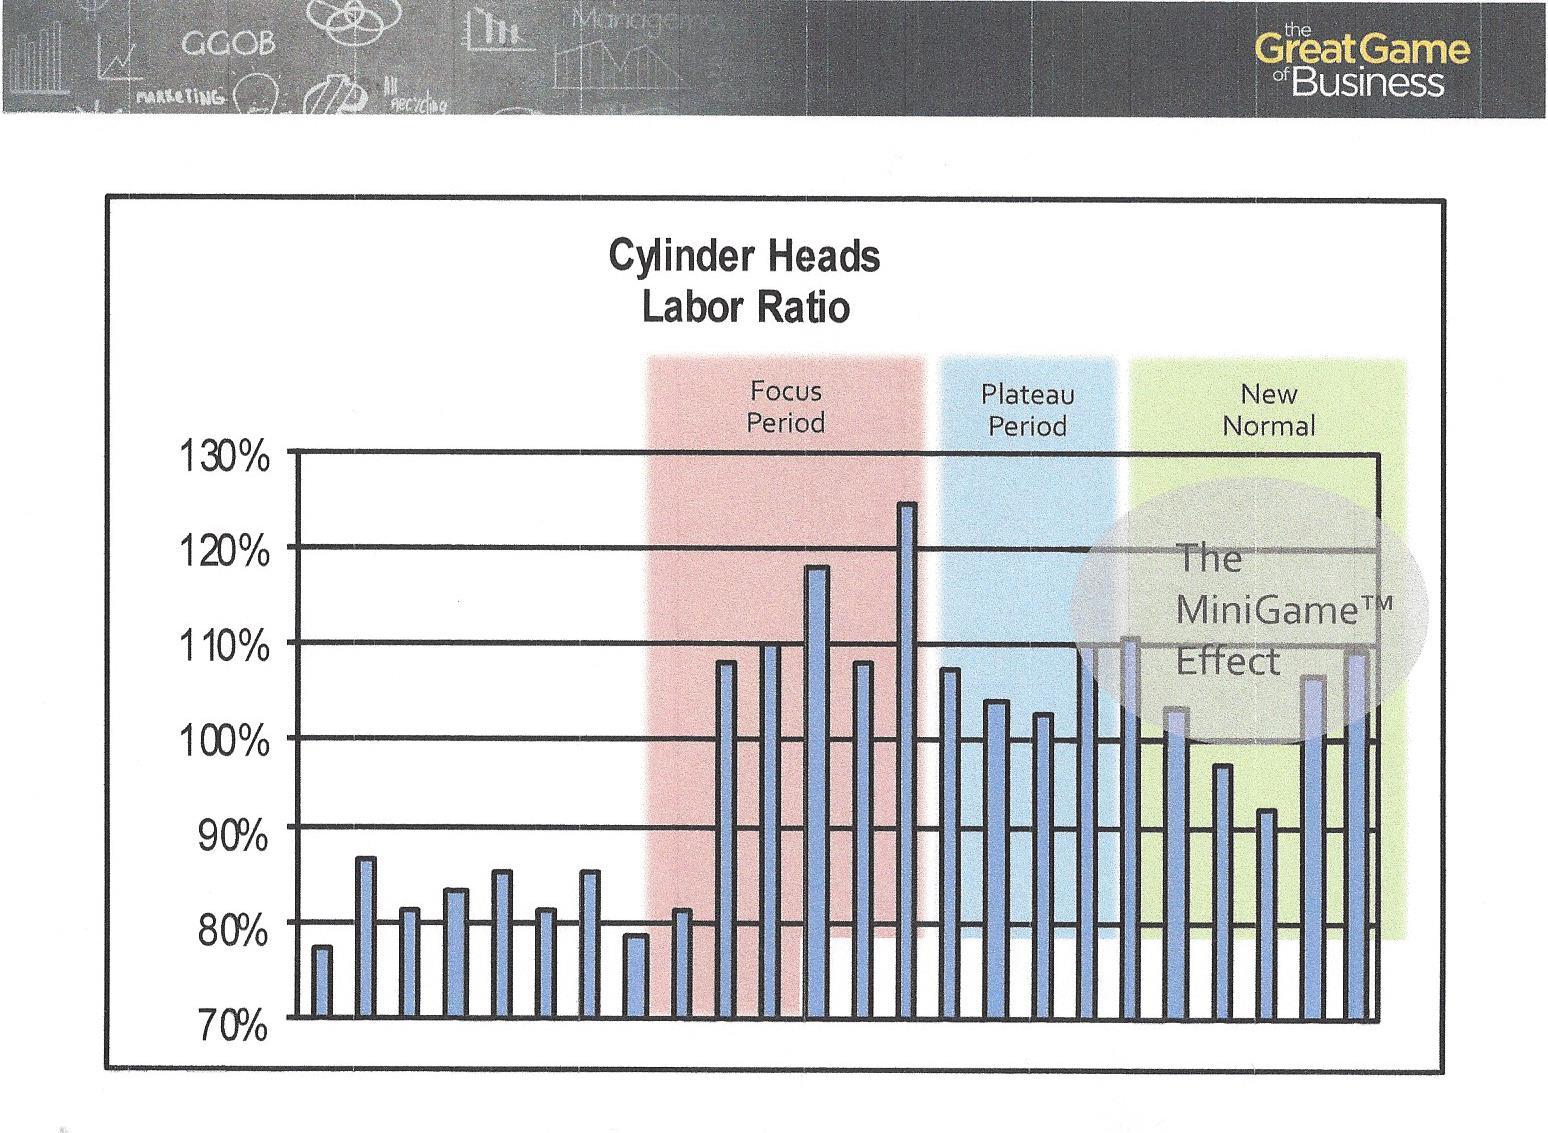 GGOB MiniGame Effect Cylinder Heads Labor Ratio.jpg